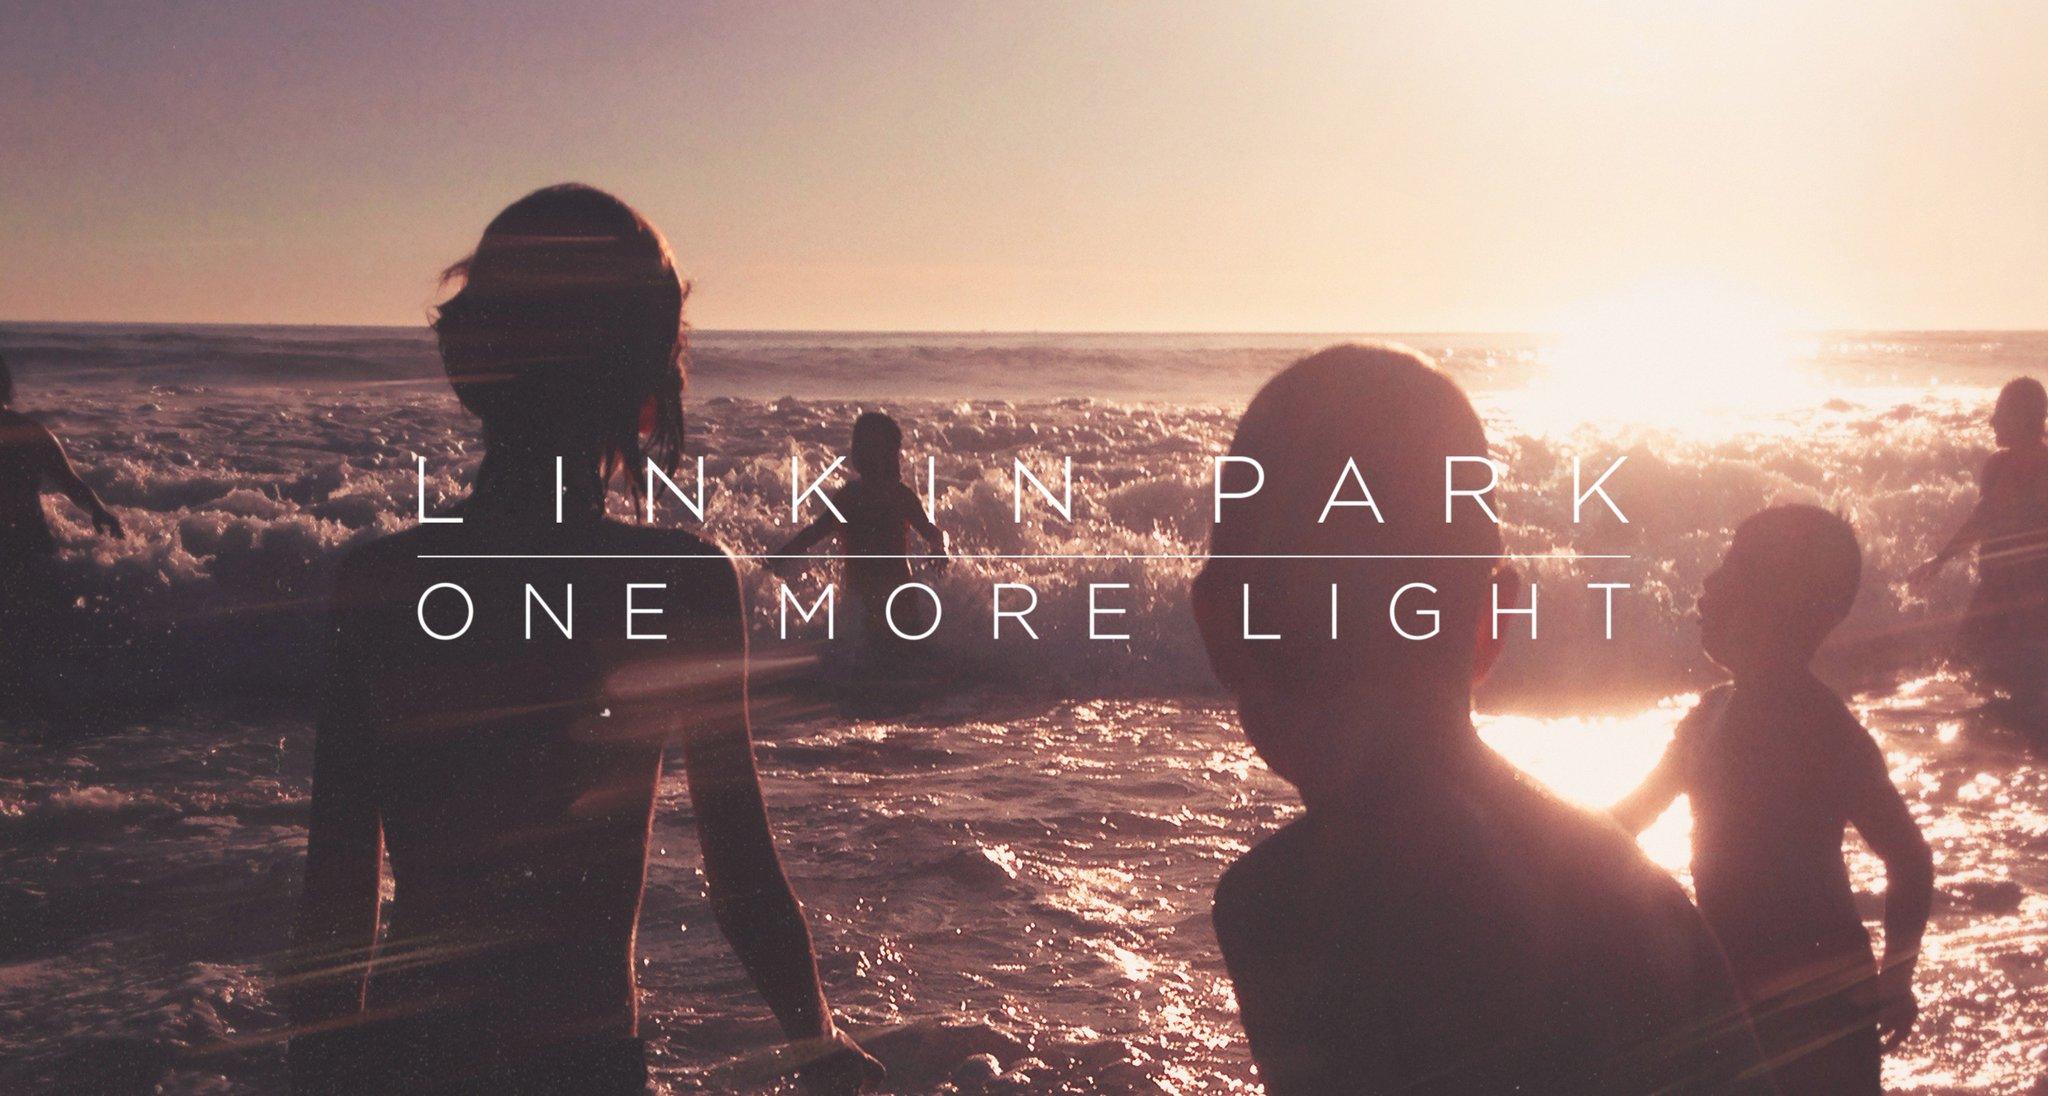 Download / stream #OneMoreLight, available everywhere: https://t.co/VIlD5hOqFU https://t.co/NxruZlOjbC